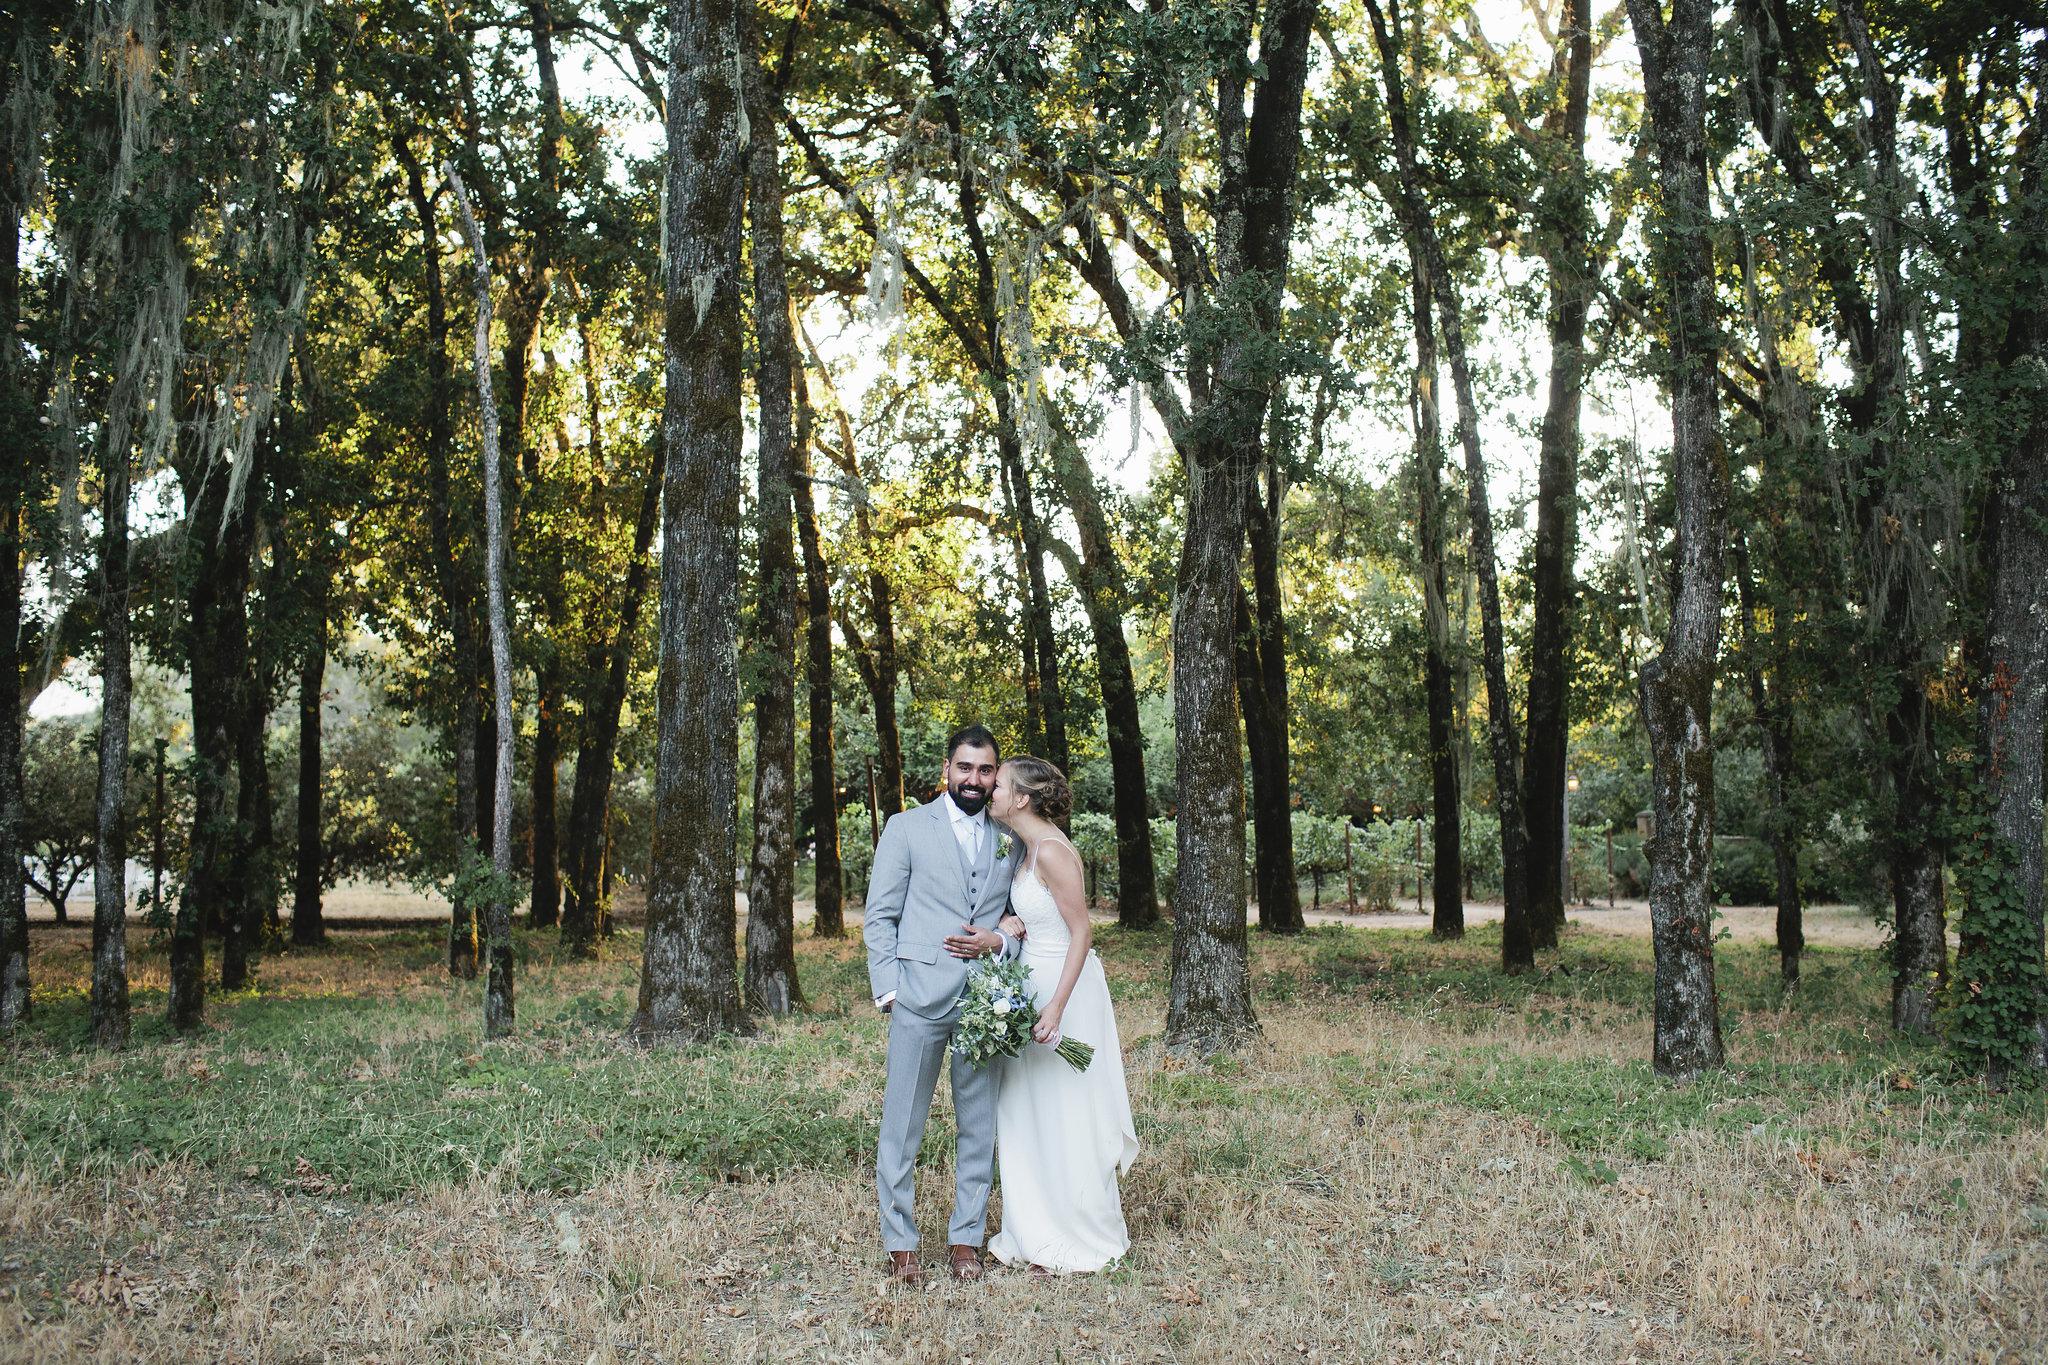 Campovida-Wedding-064.JPG